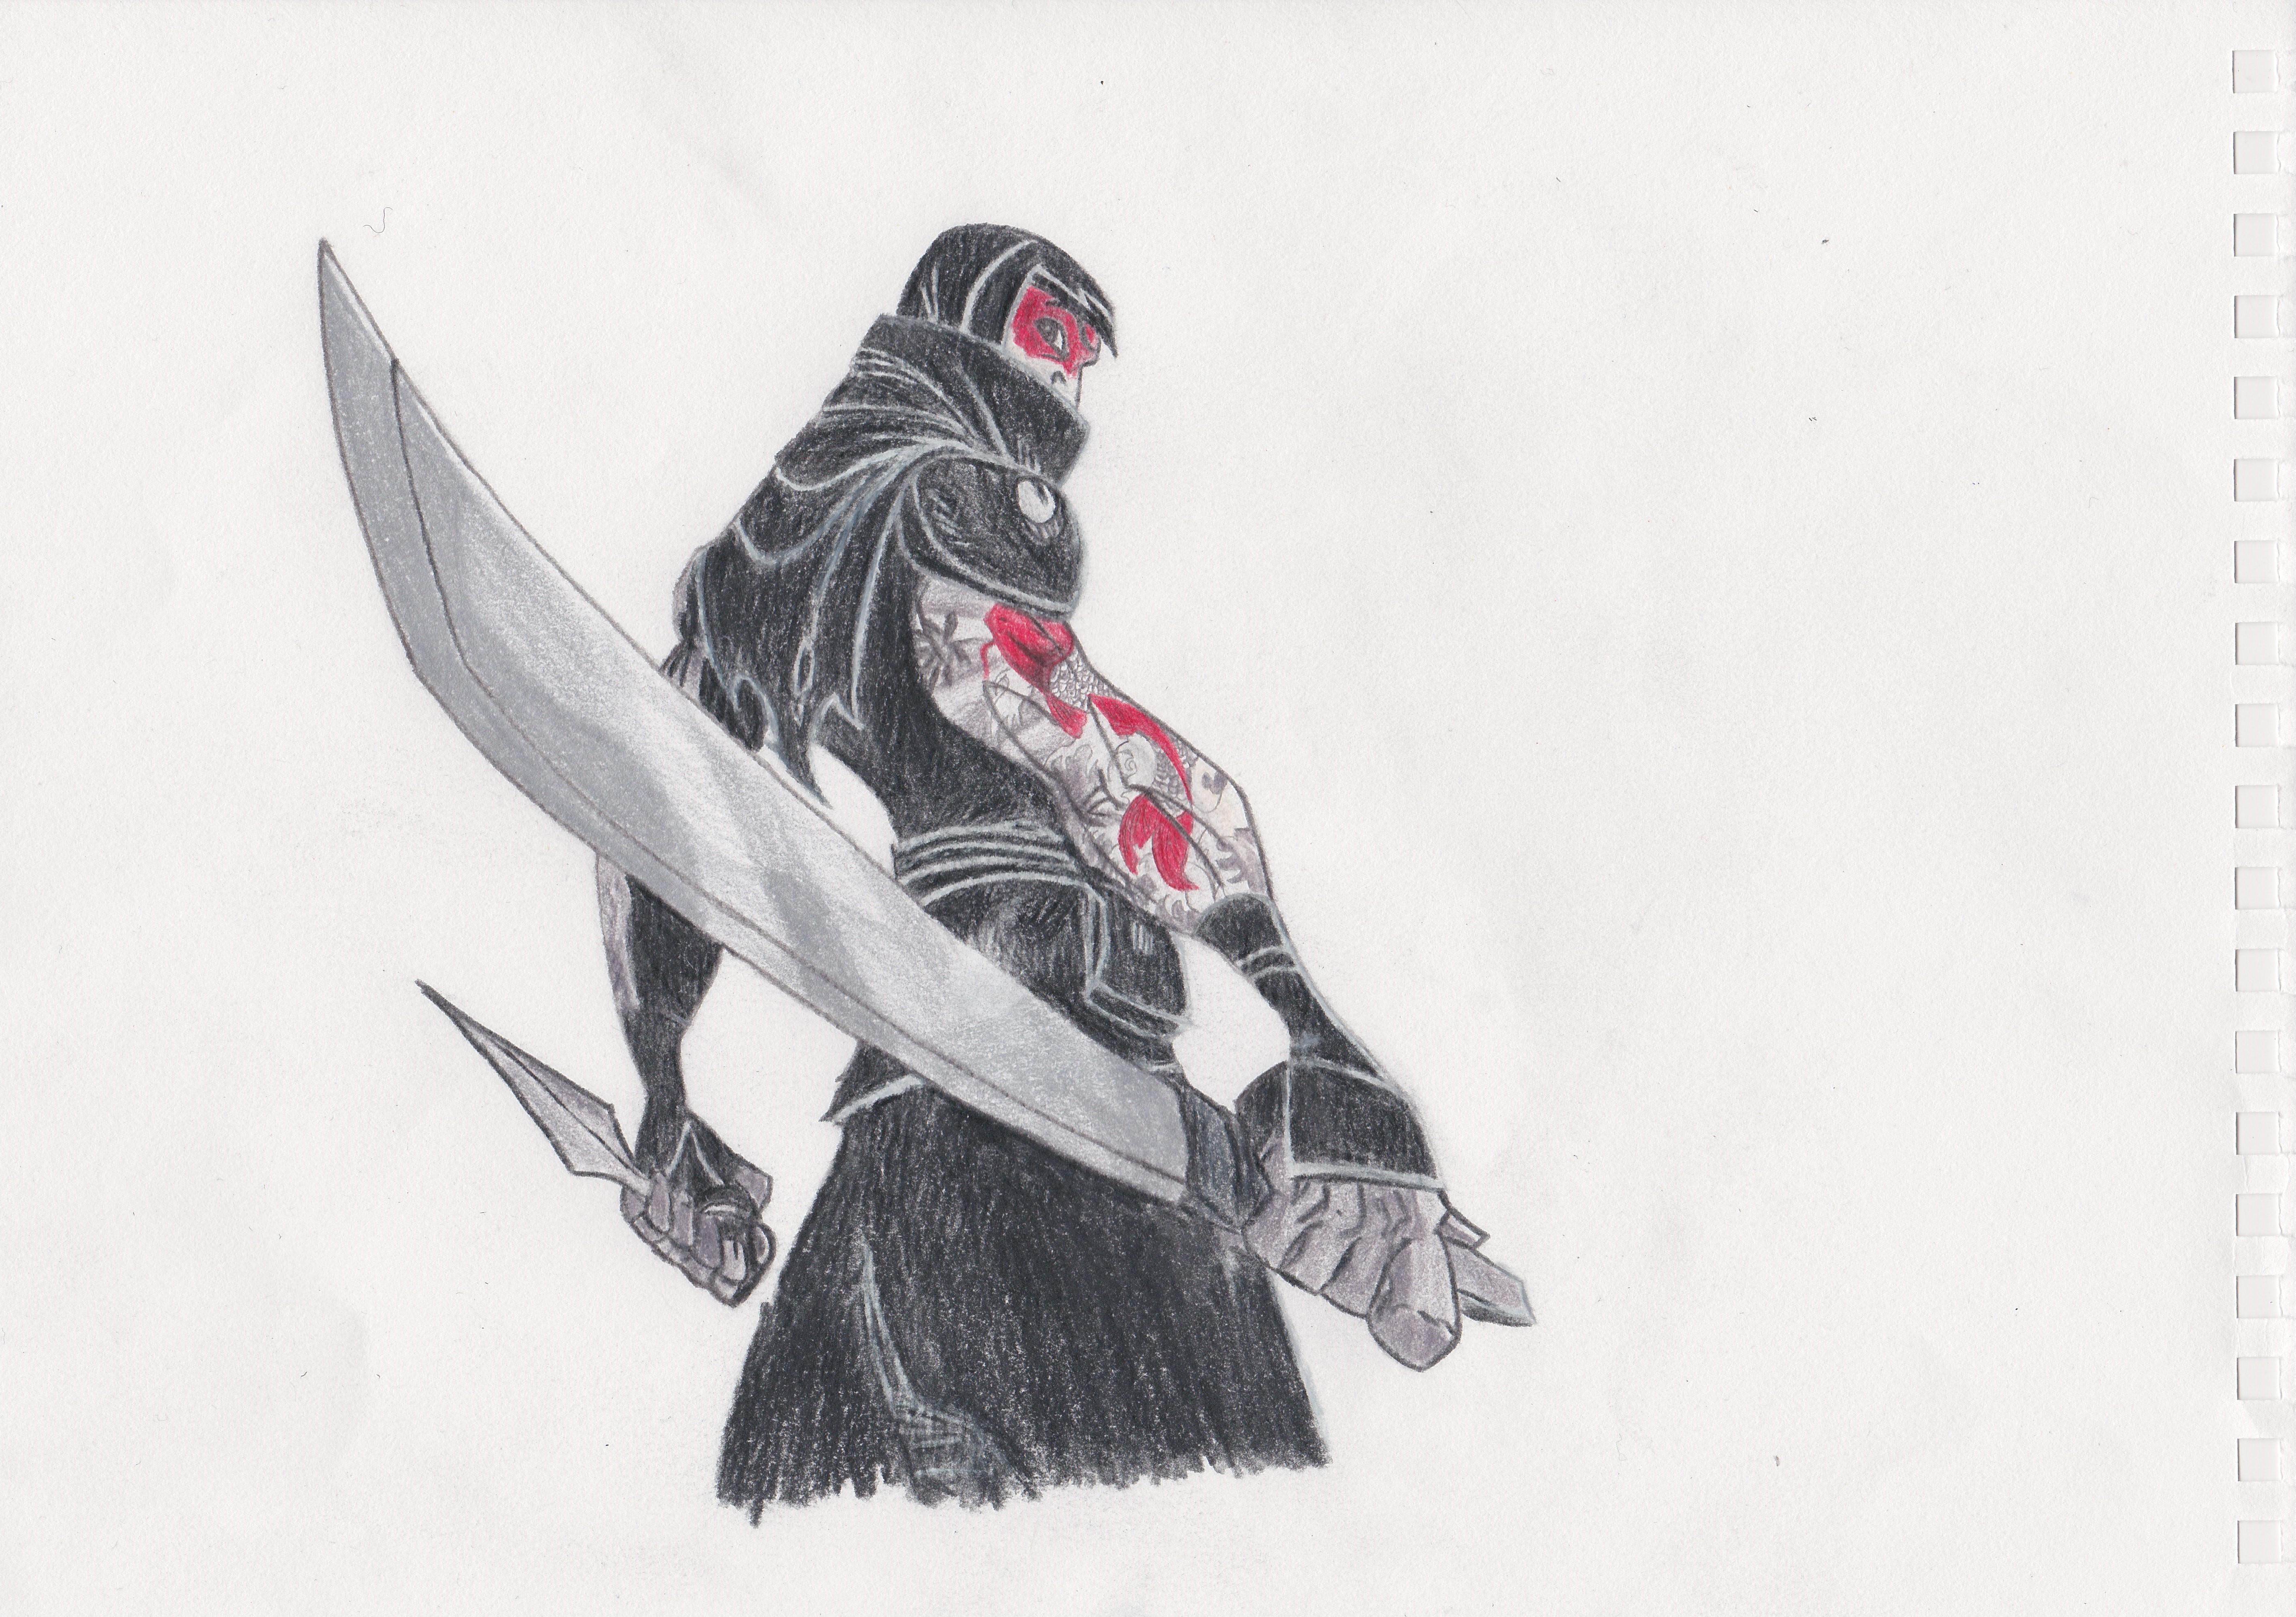 Mark Of The Ninja By Theflyingbeer On Deviantart